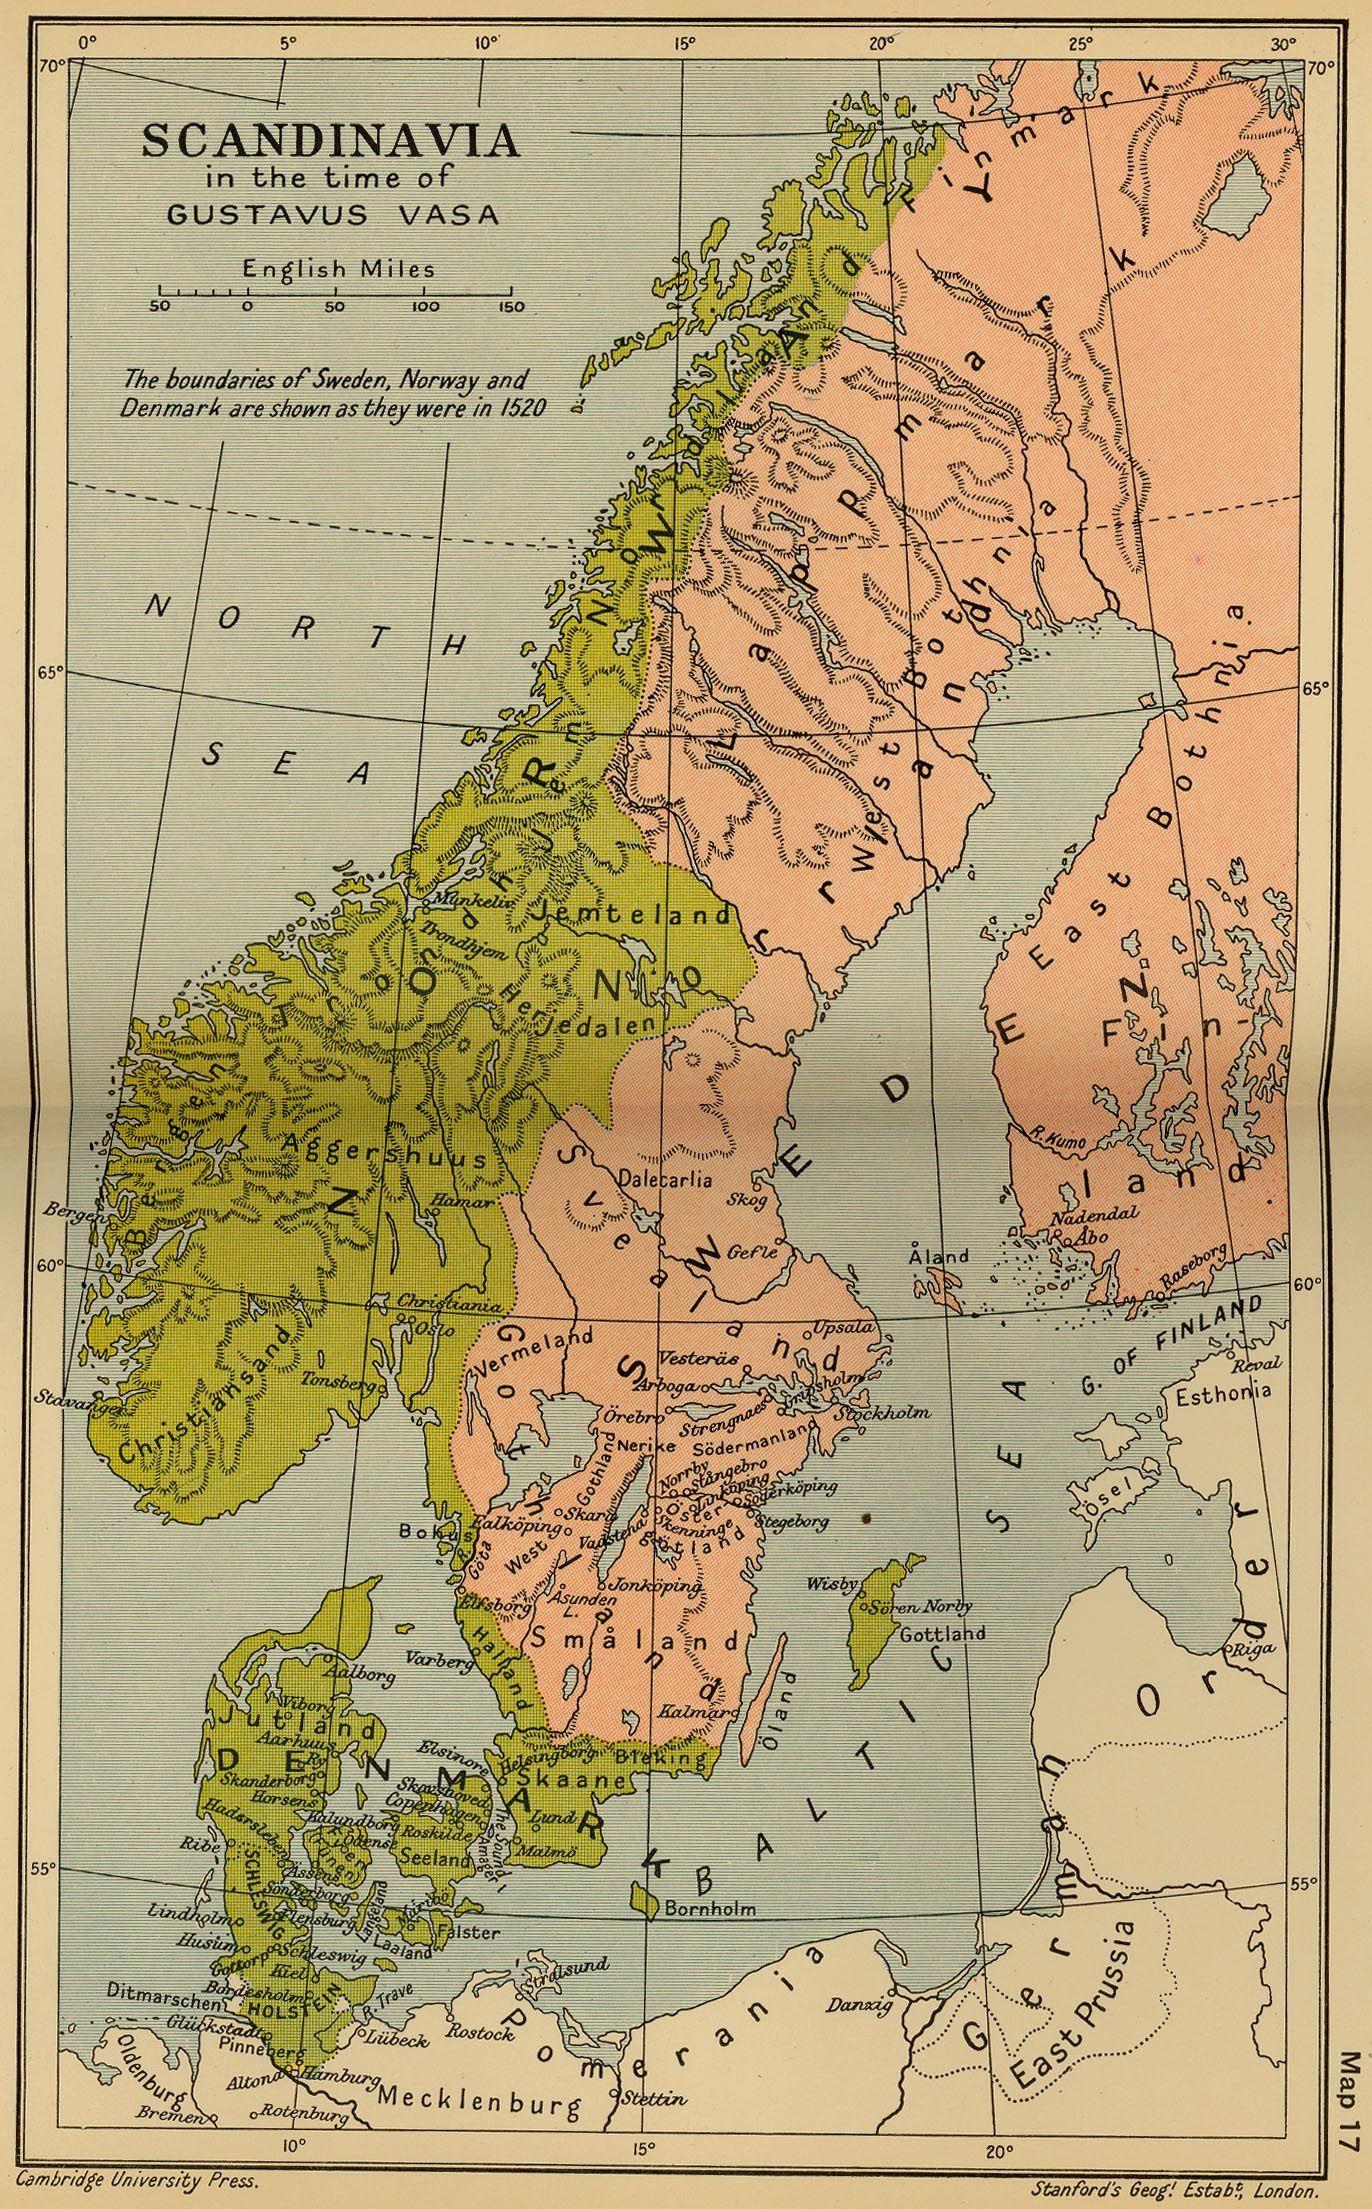 Scandinavia 1523 Jpg 1372 2209 Sweden Map Travel Posters Historical Maps